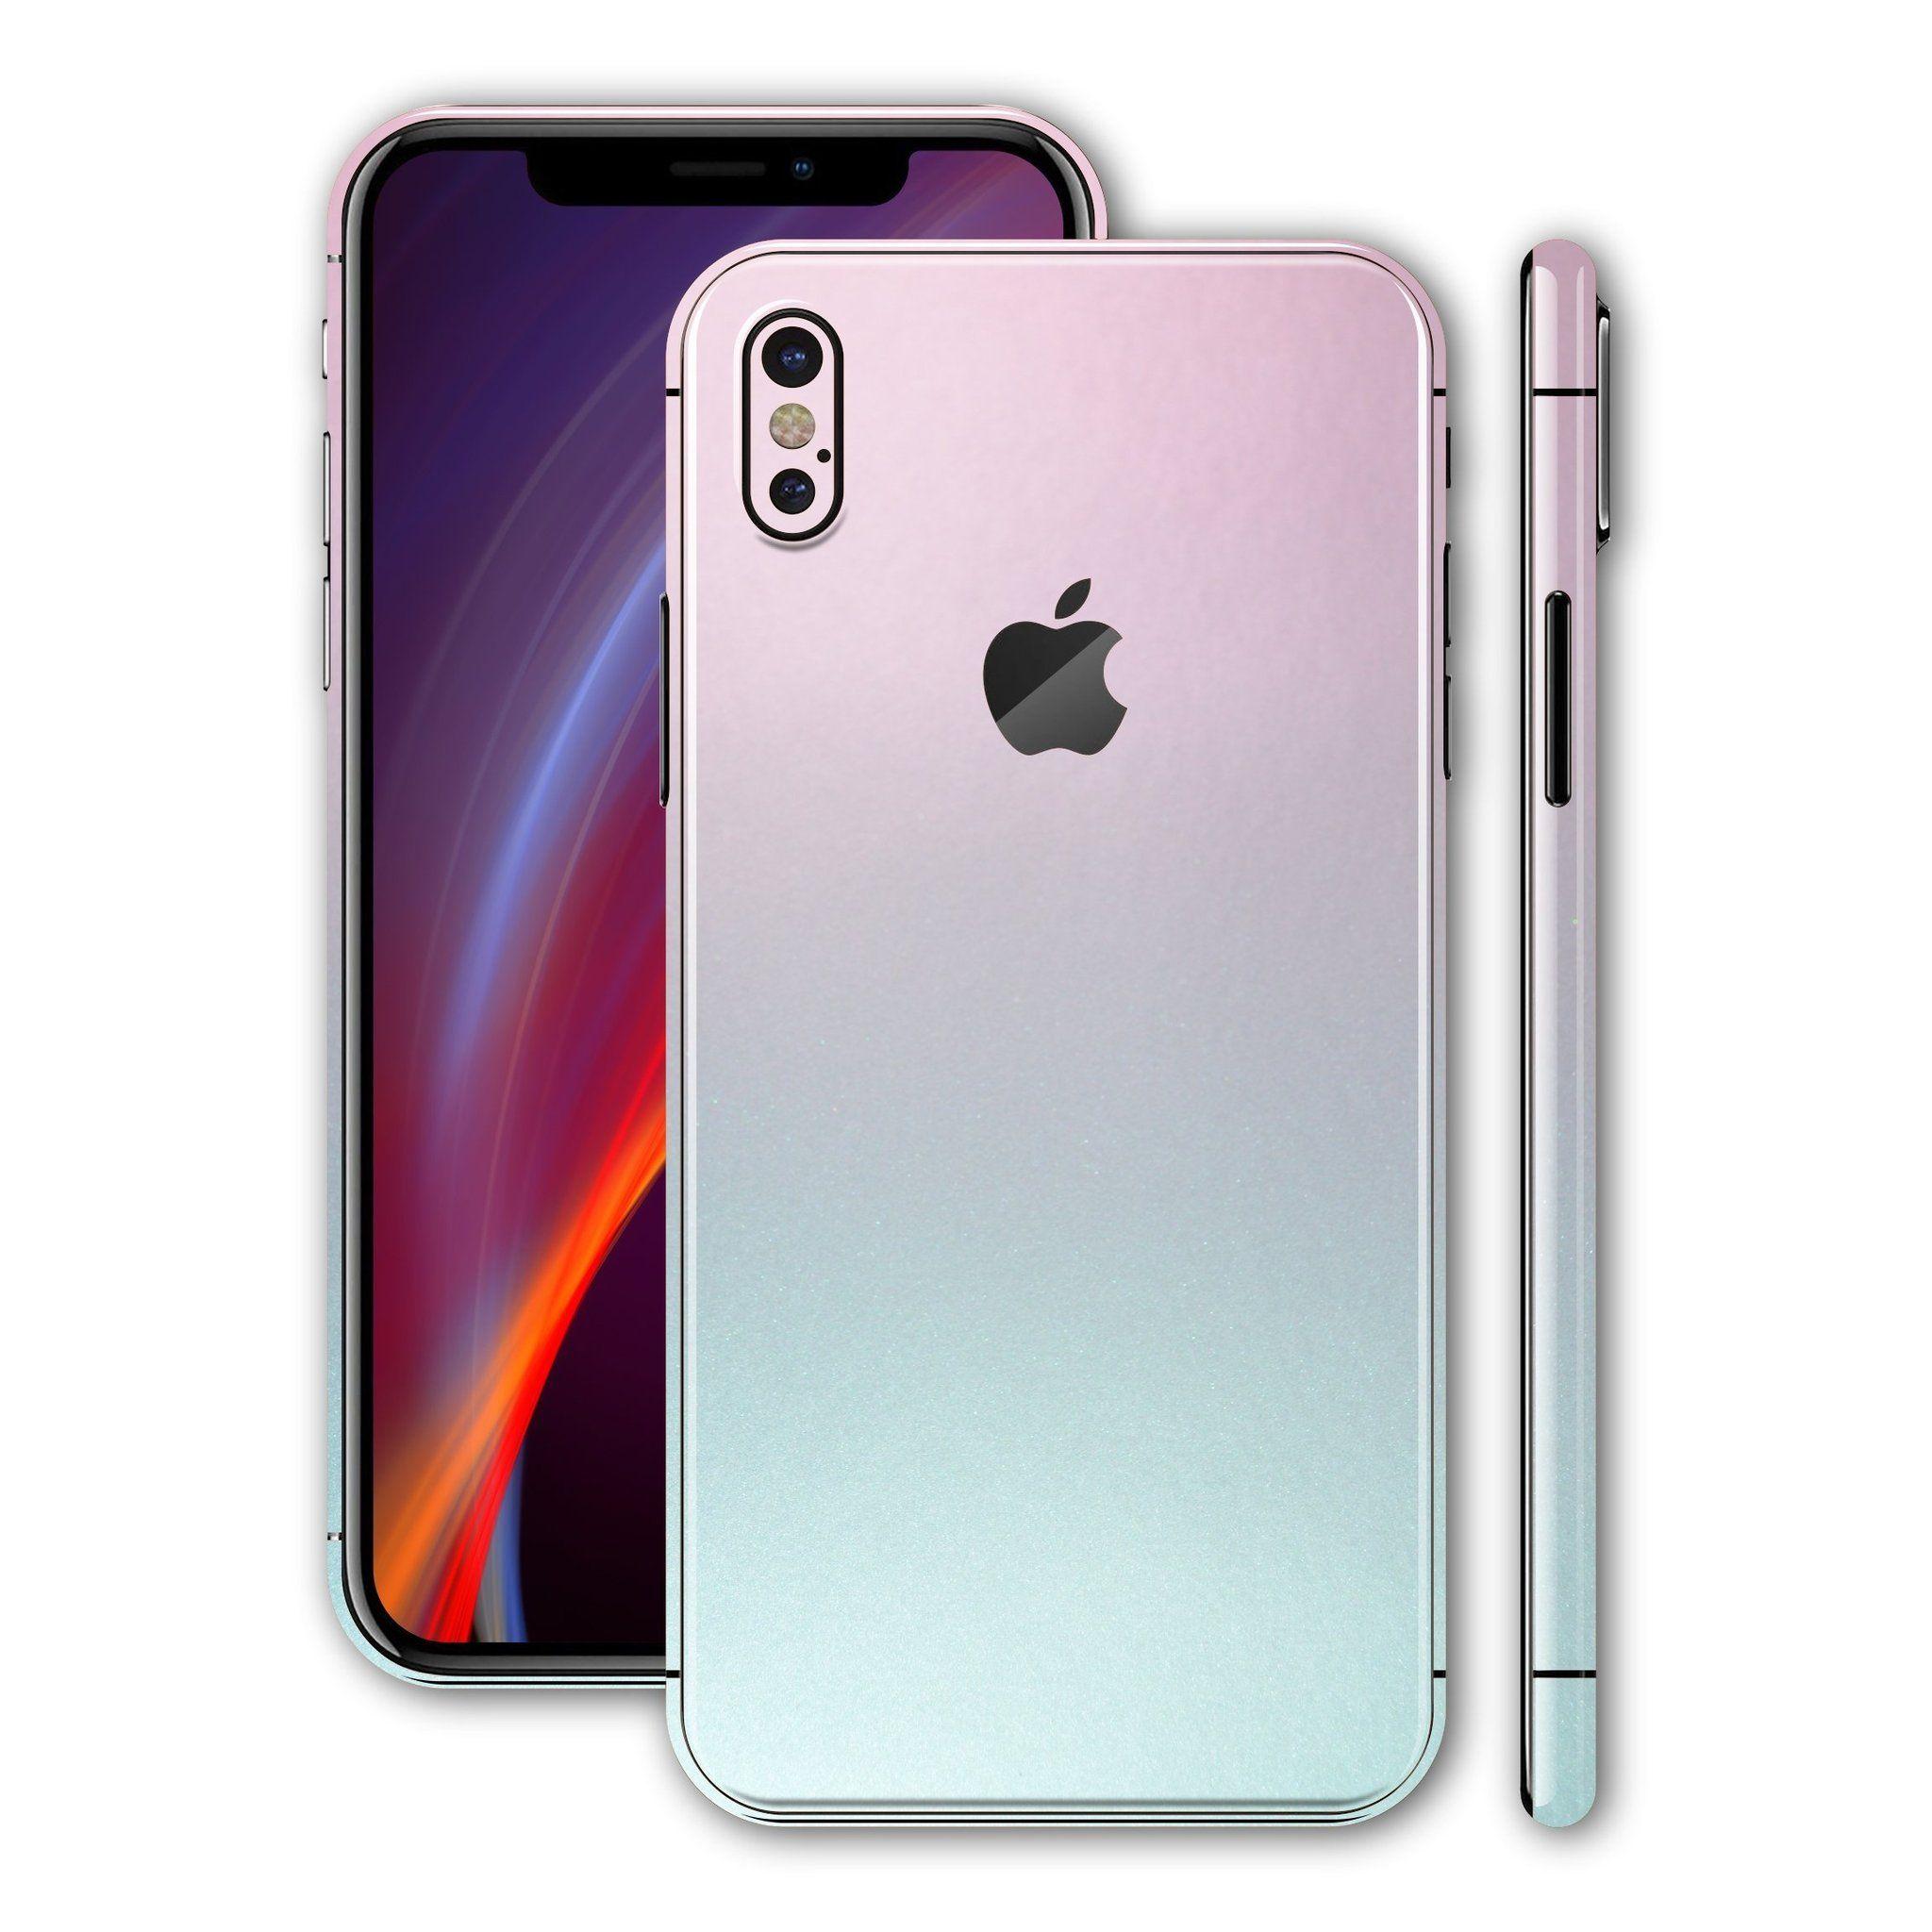 iPhone XS MAX CHAMELEON AMETHYST MATT Metallic Skin